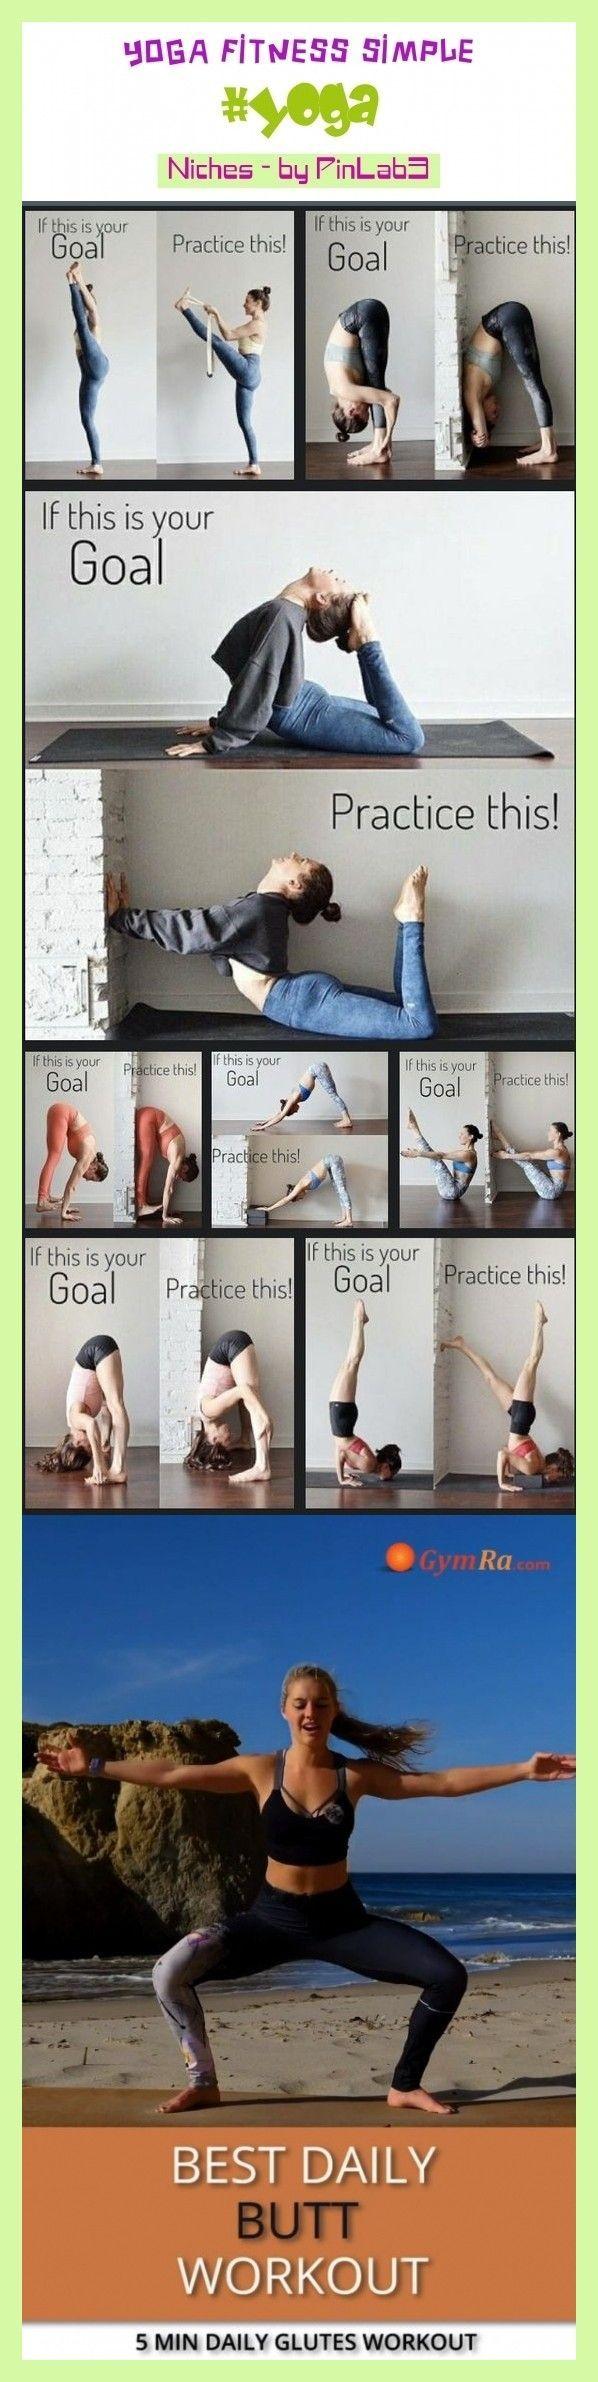 Yoga fitness simple #fitness #simple  ; yoga fitness simple ; yoga fitness simpl..., #afterworkoutme...